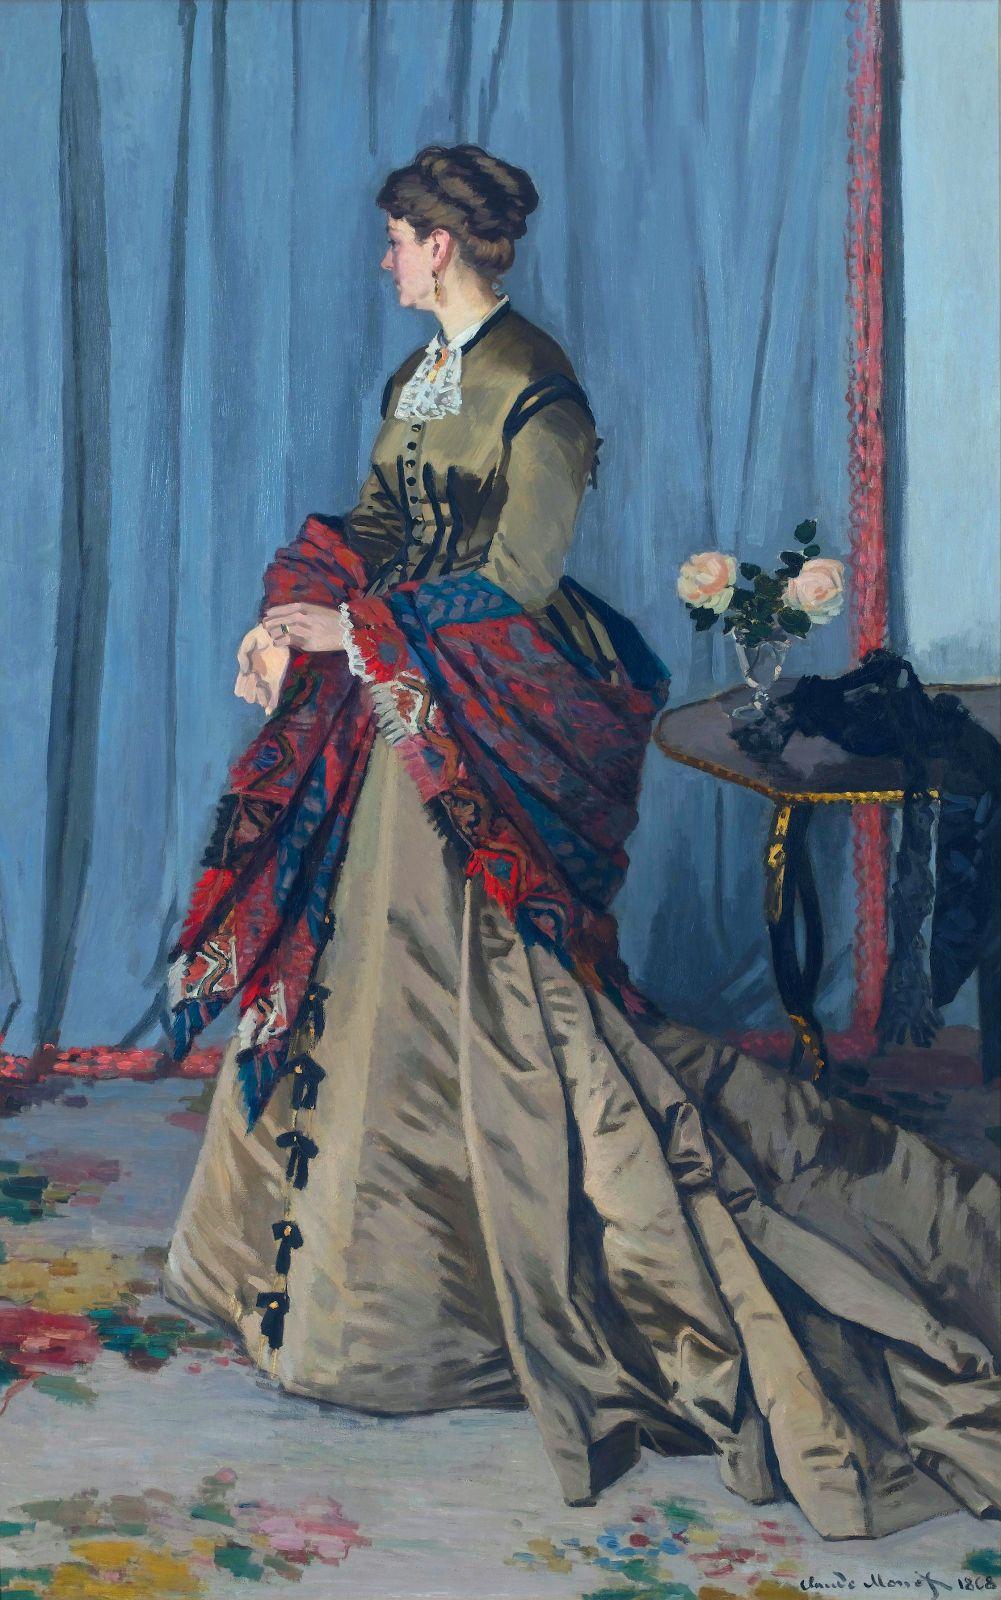 fd295630f1b Posing with Posies ⊱ paintings of women and flowers - Portrait of Madame  Gaudibert - Claude Monet